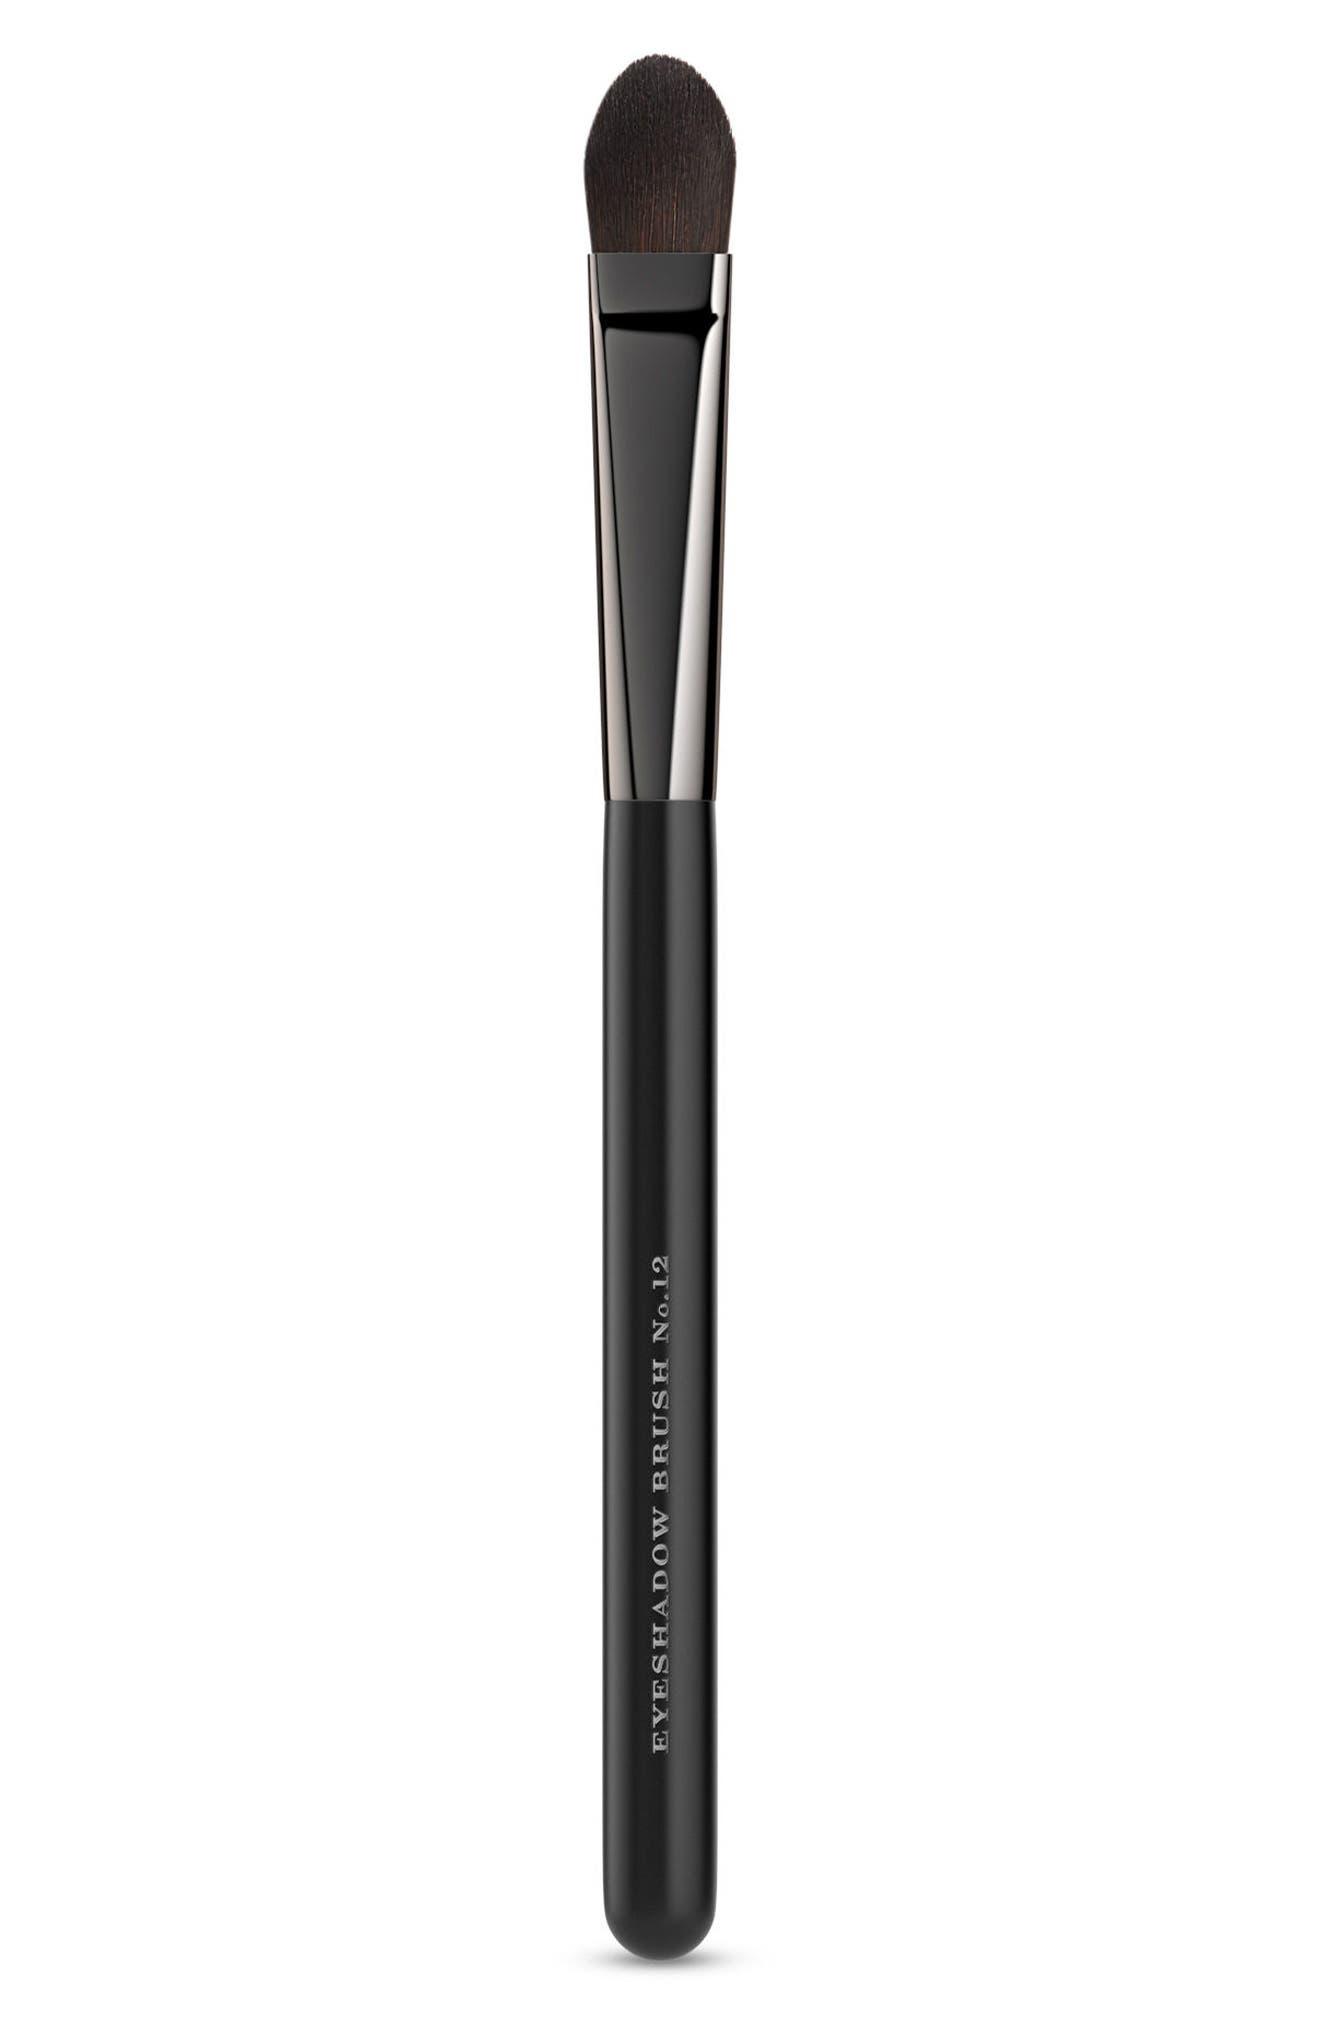 Burberry Beauty Medium Eyeshadow Brush No. 12